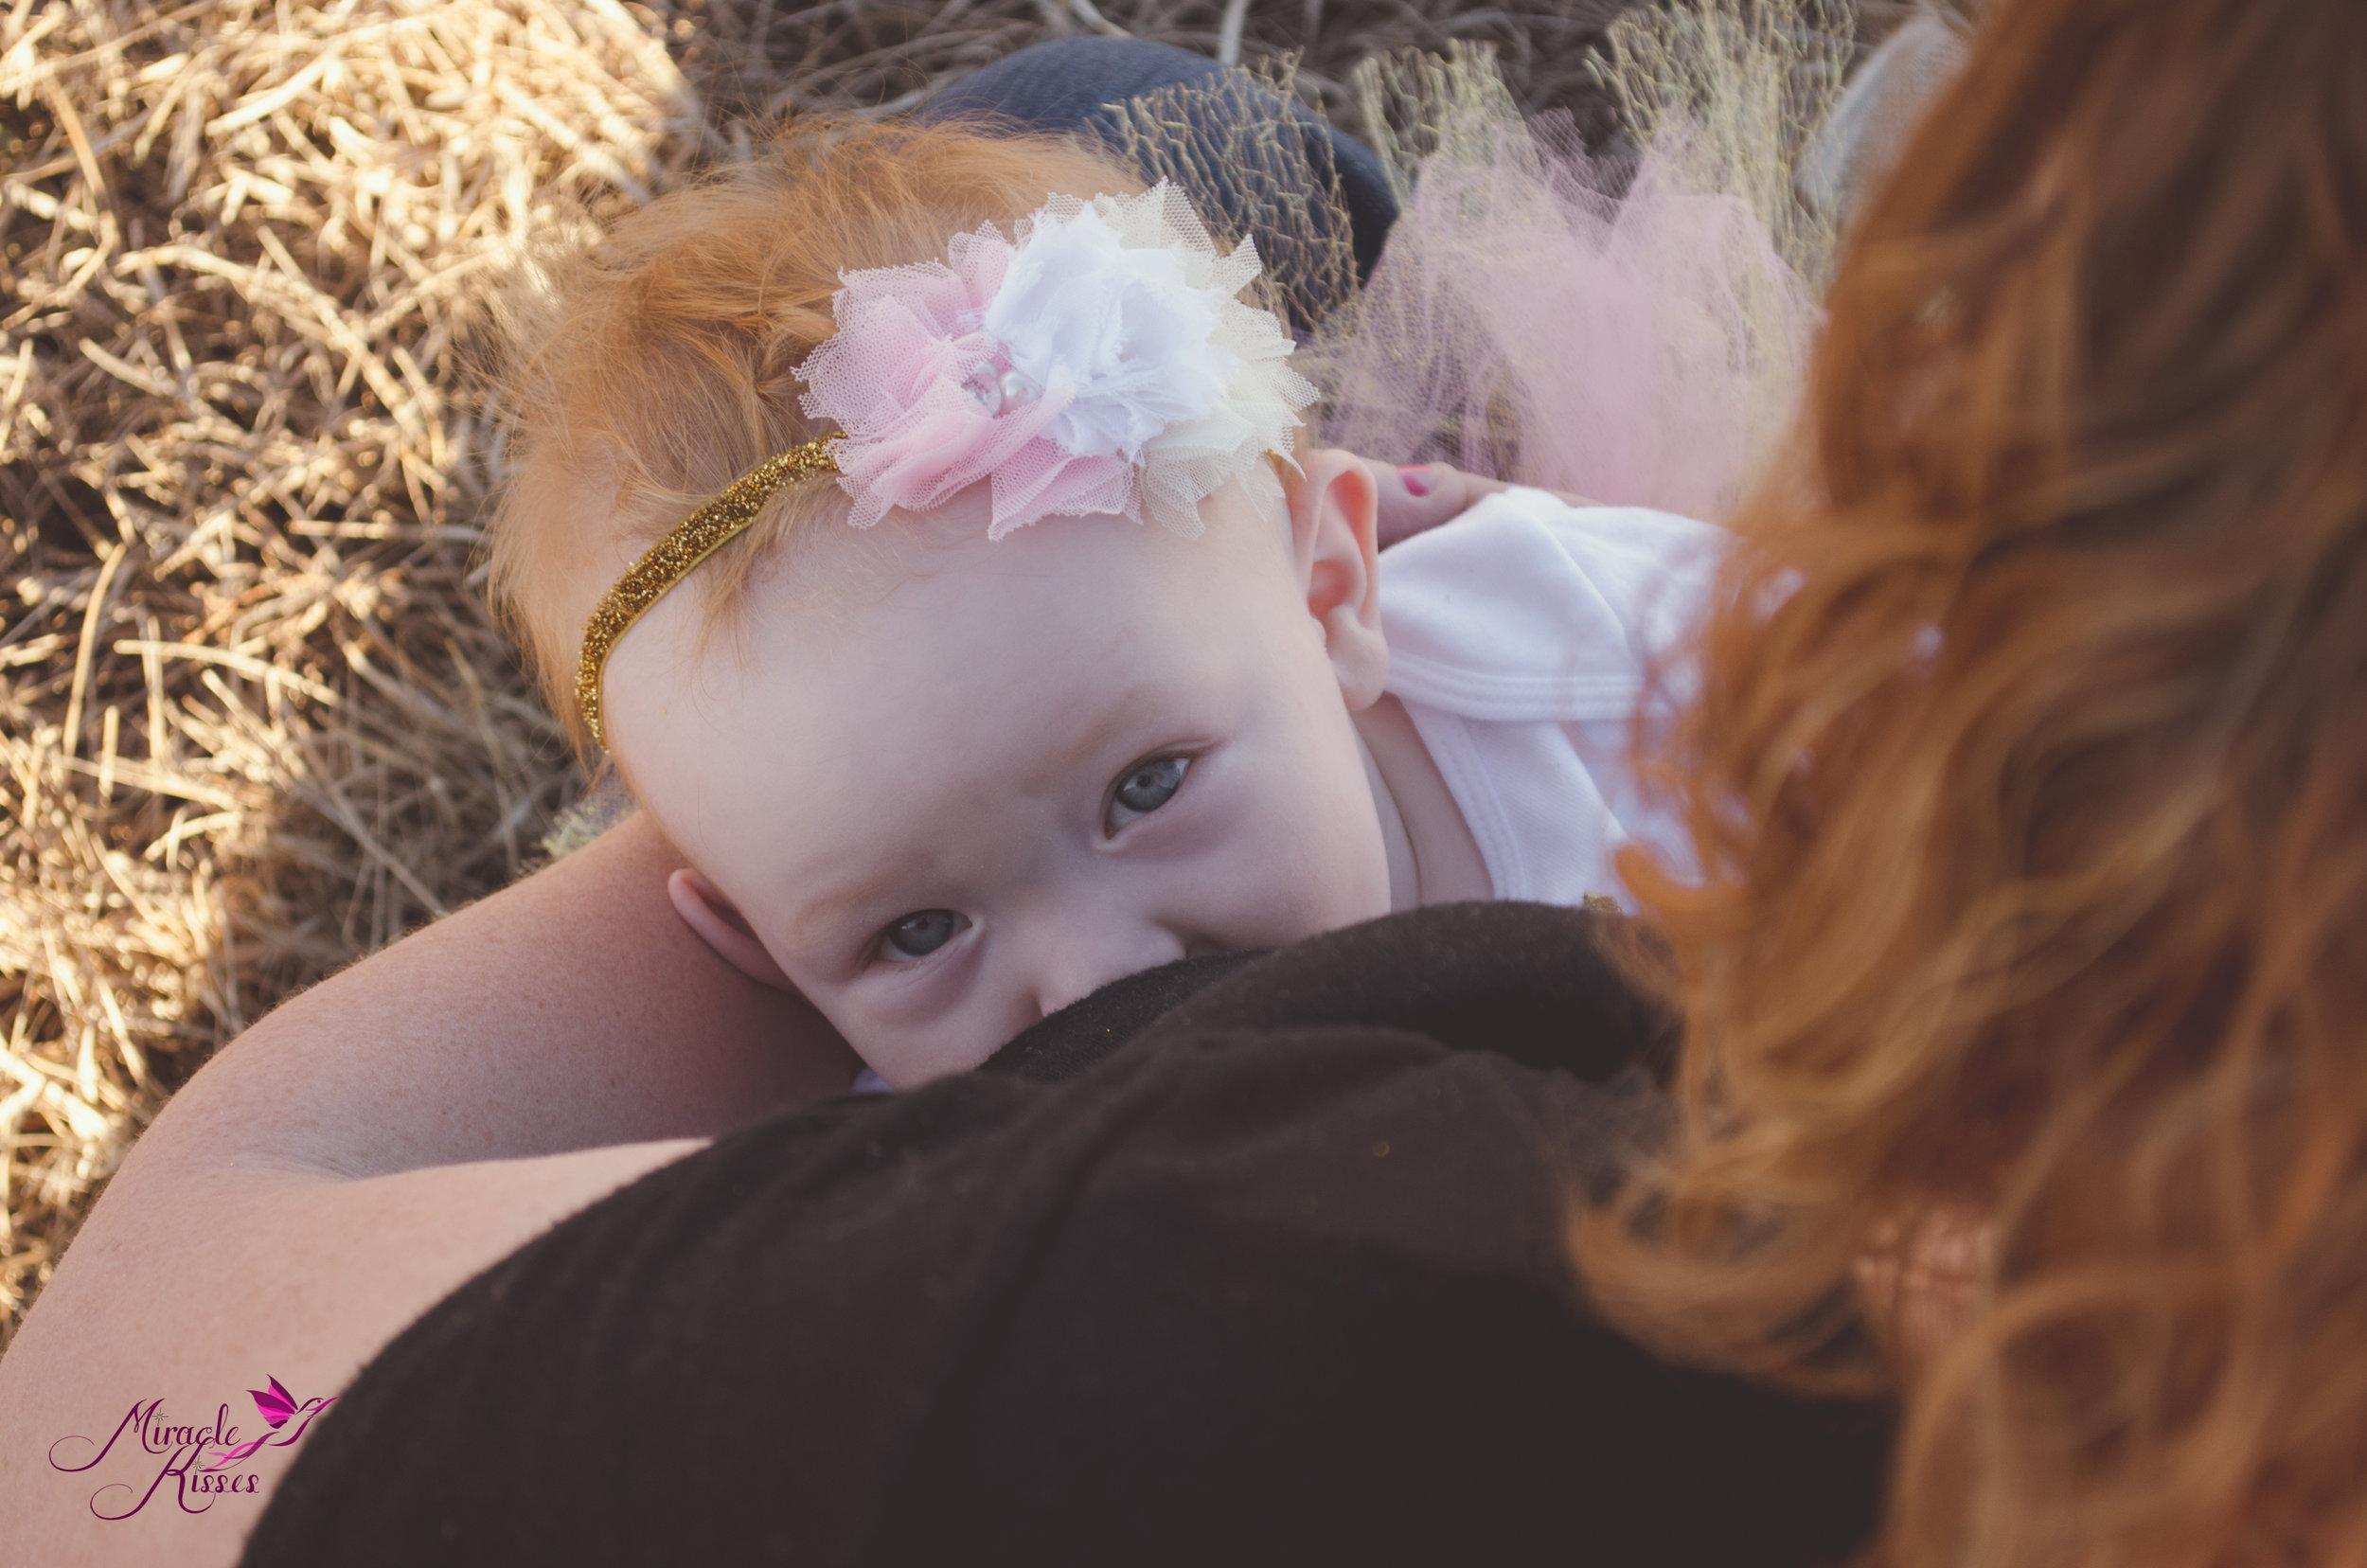 Milk peeping, Breastfeeding, Nursing in public